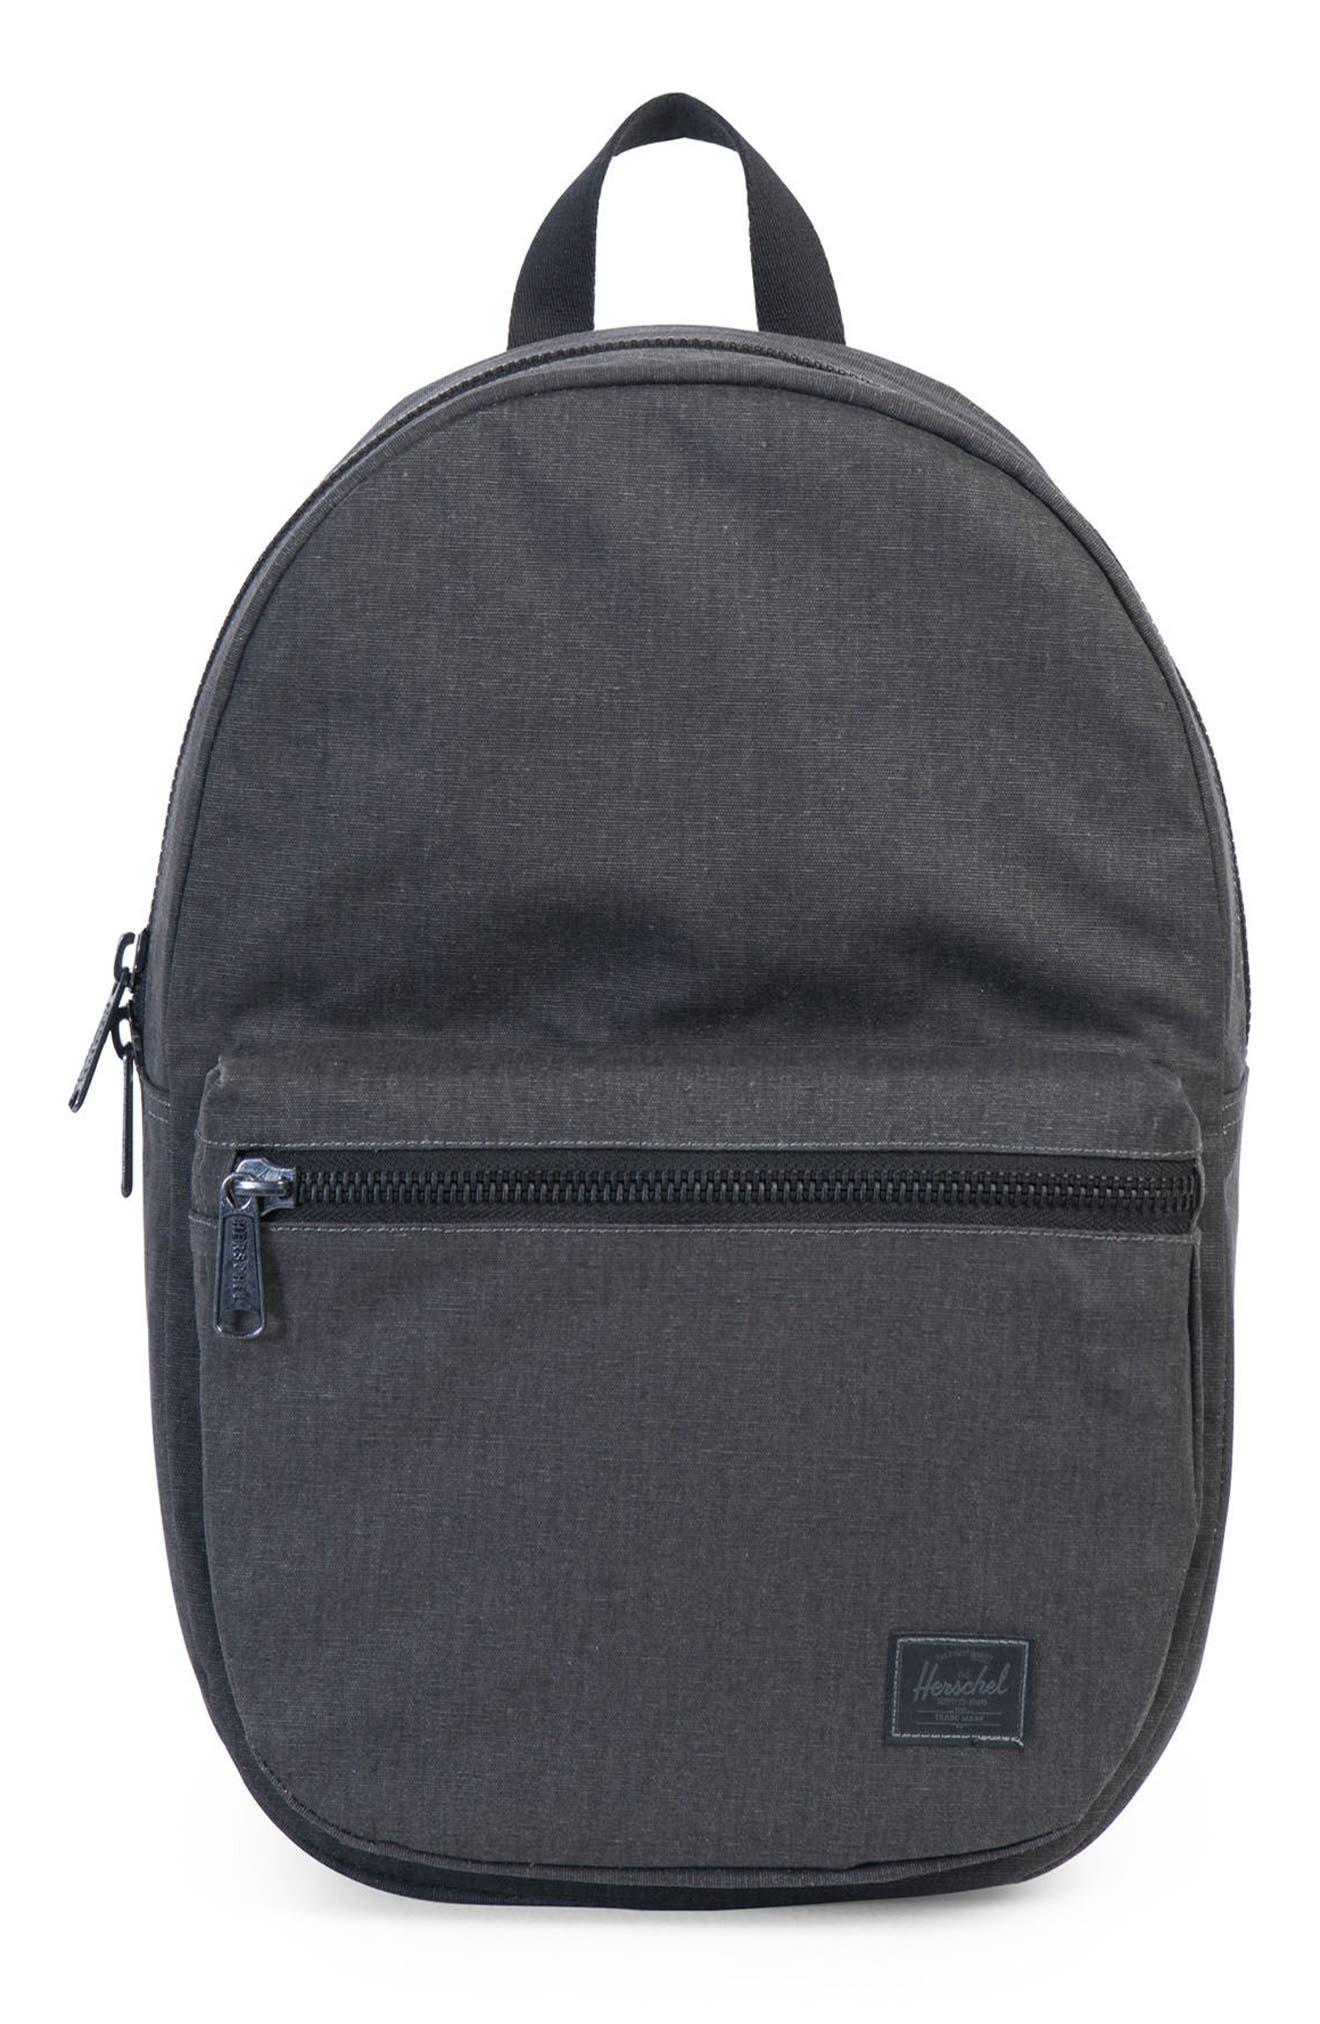 Lawson Backpack,                             Main thumbnail 1, color,                             Black Ion Washed